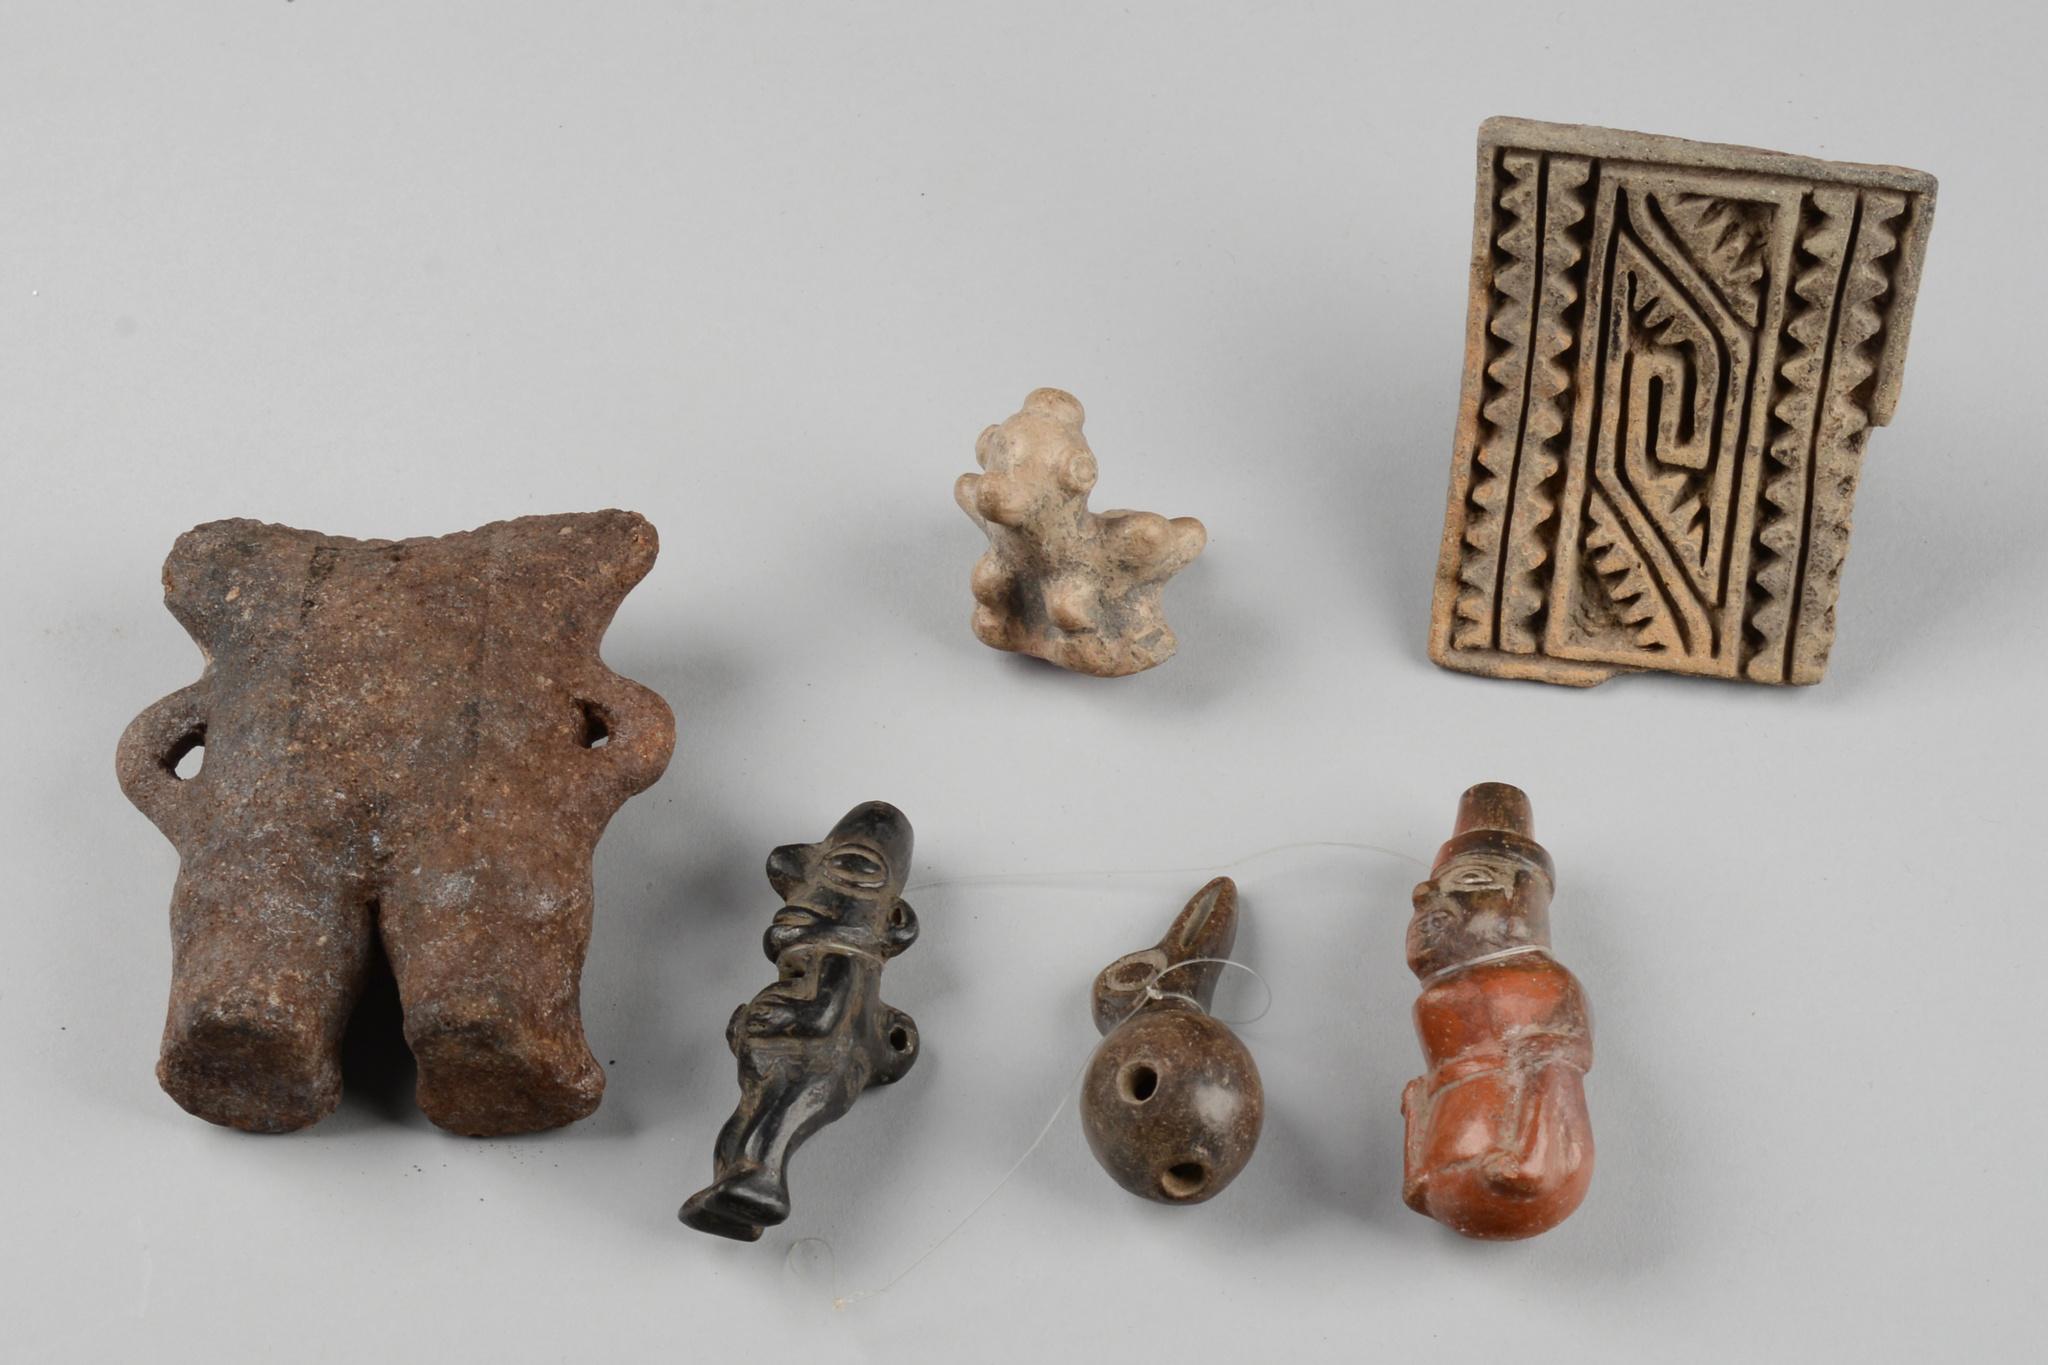 Convolute pre-Columbian artifacts